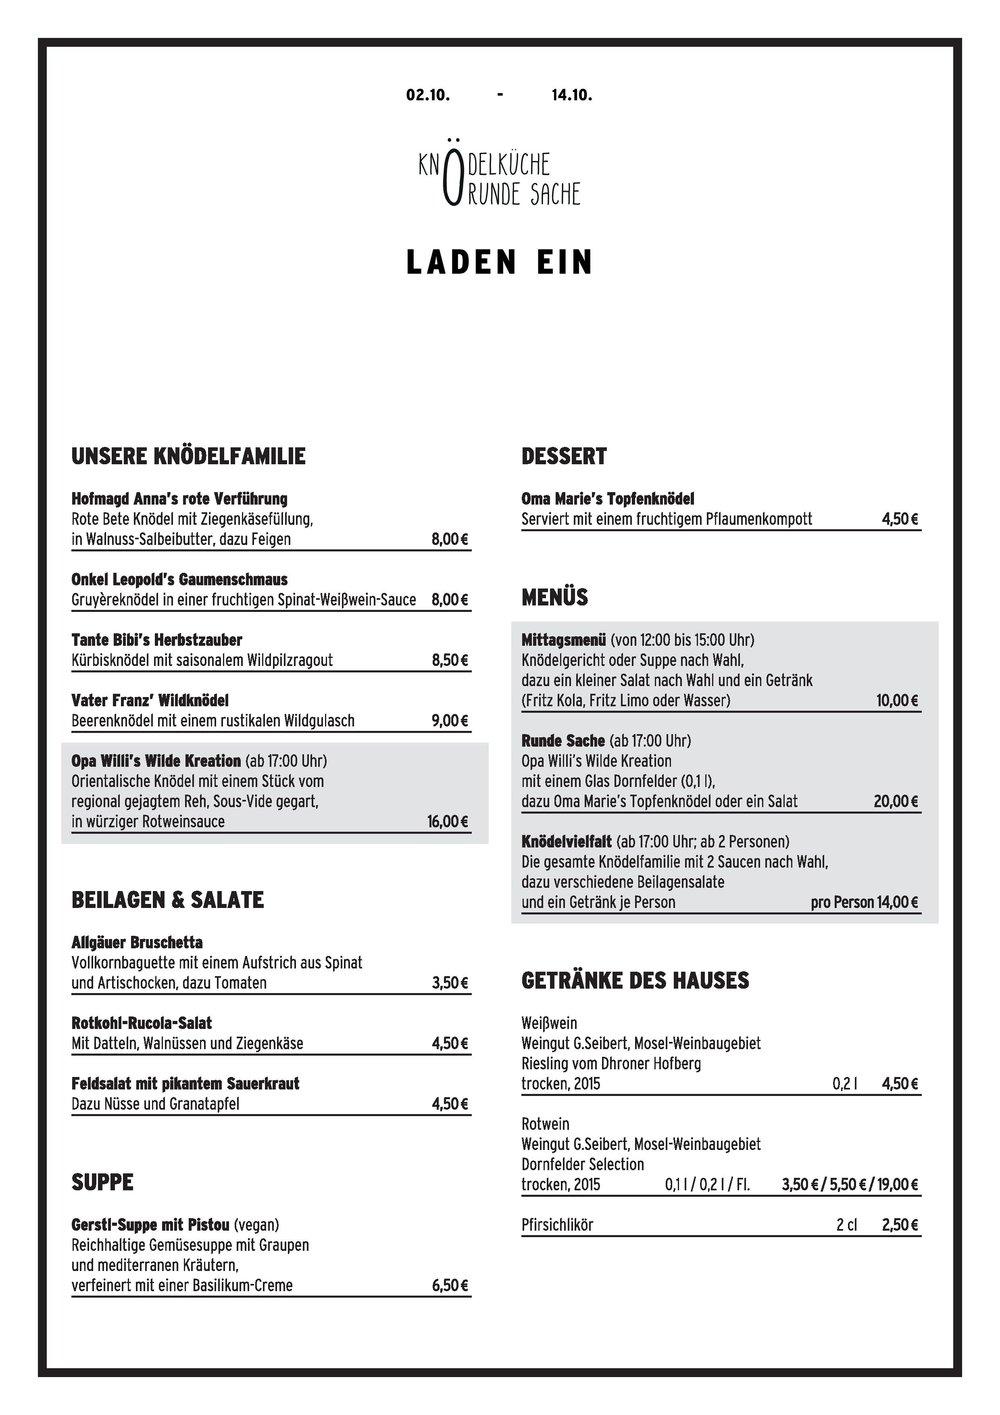 LadenEin_RundeSache_Speisekarte_DINA4-v2-page-001.jpg